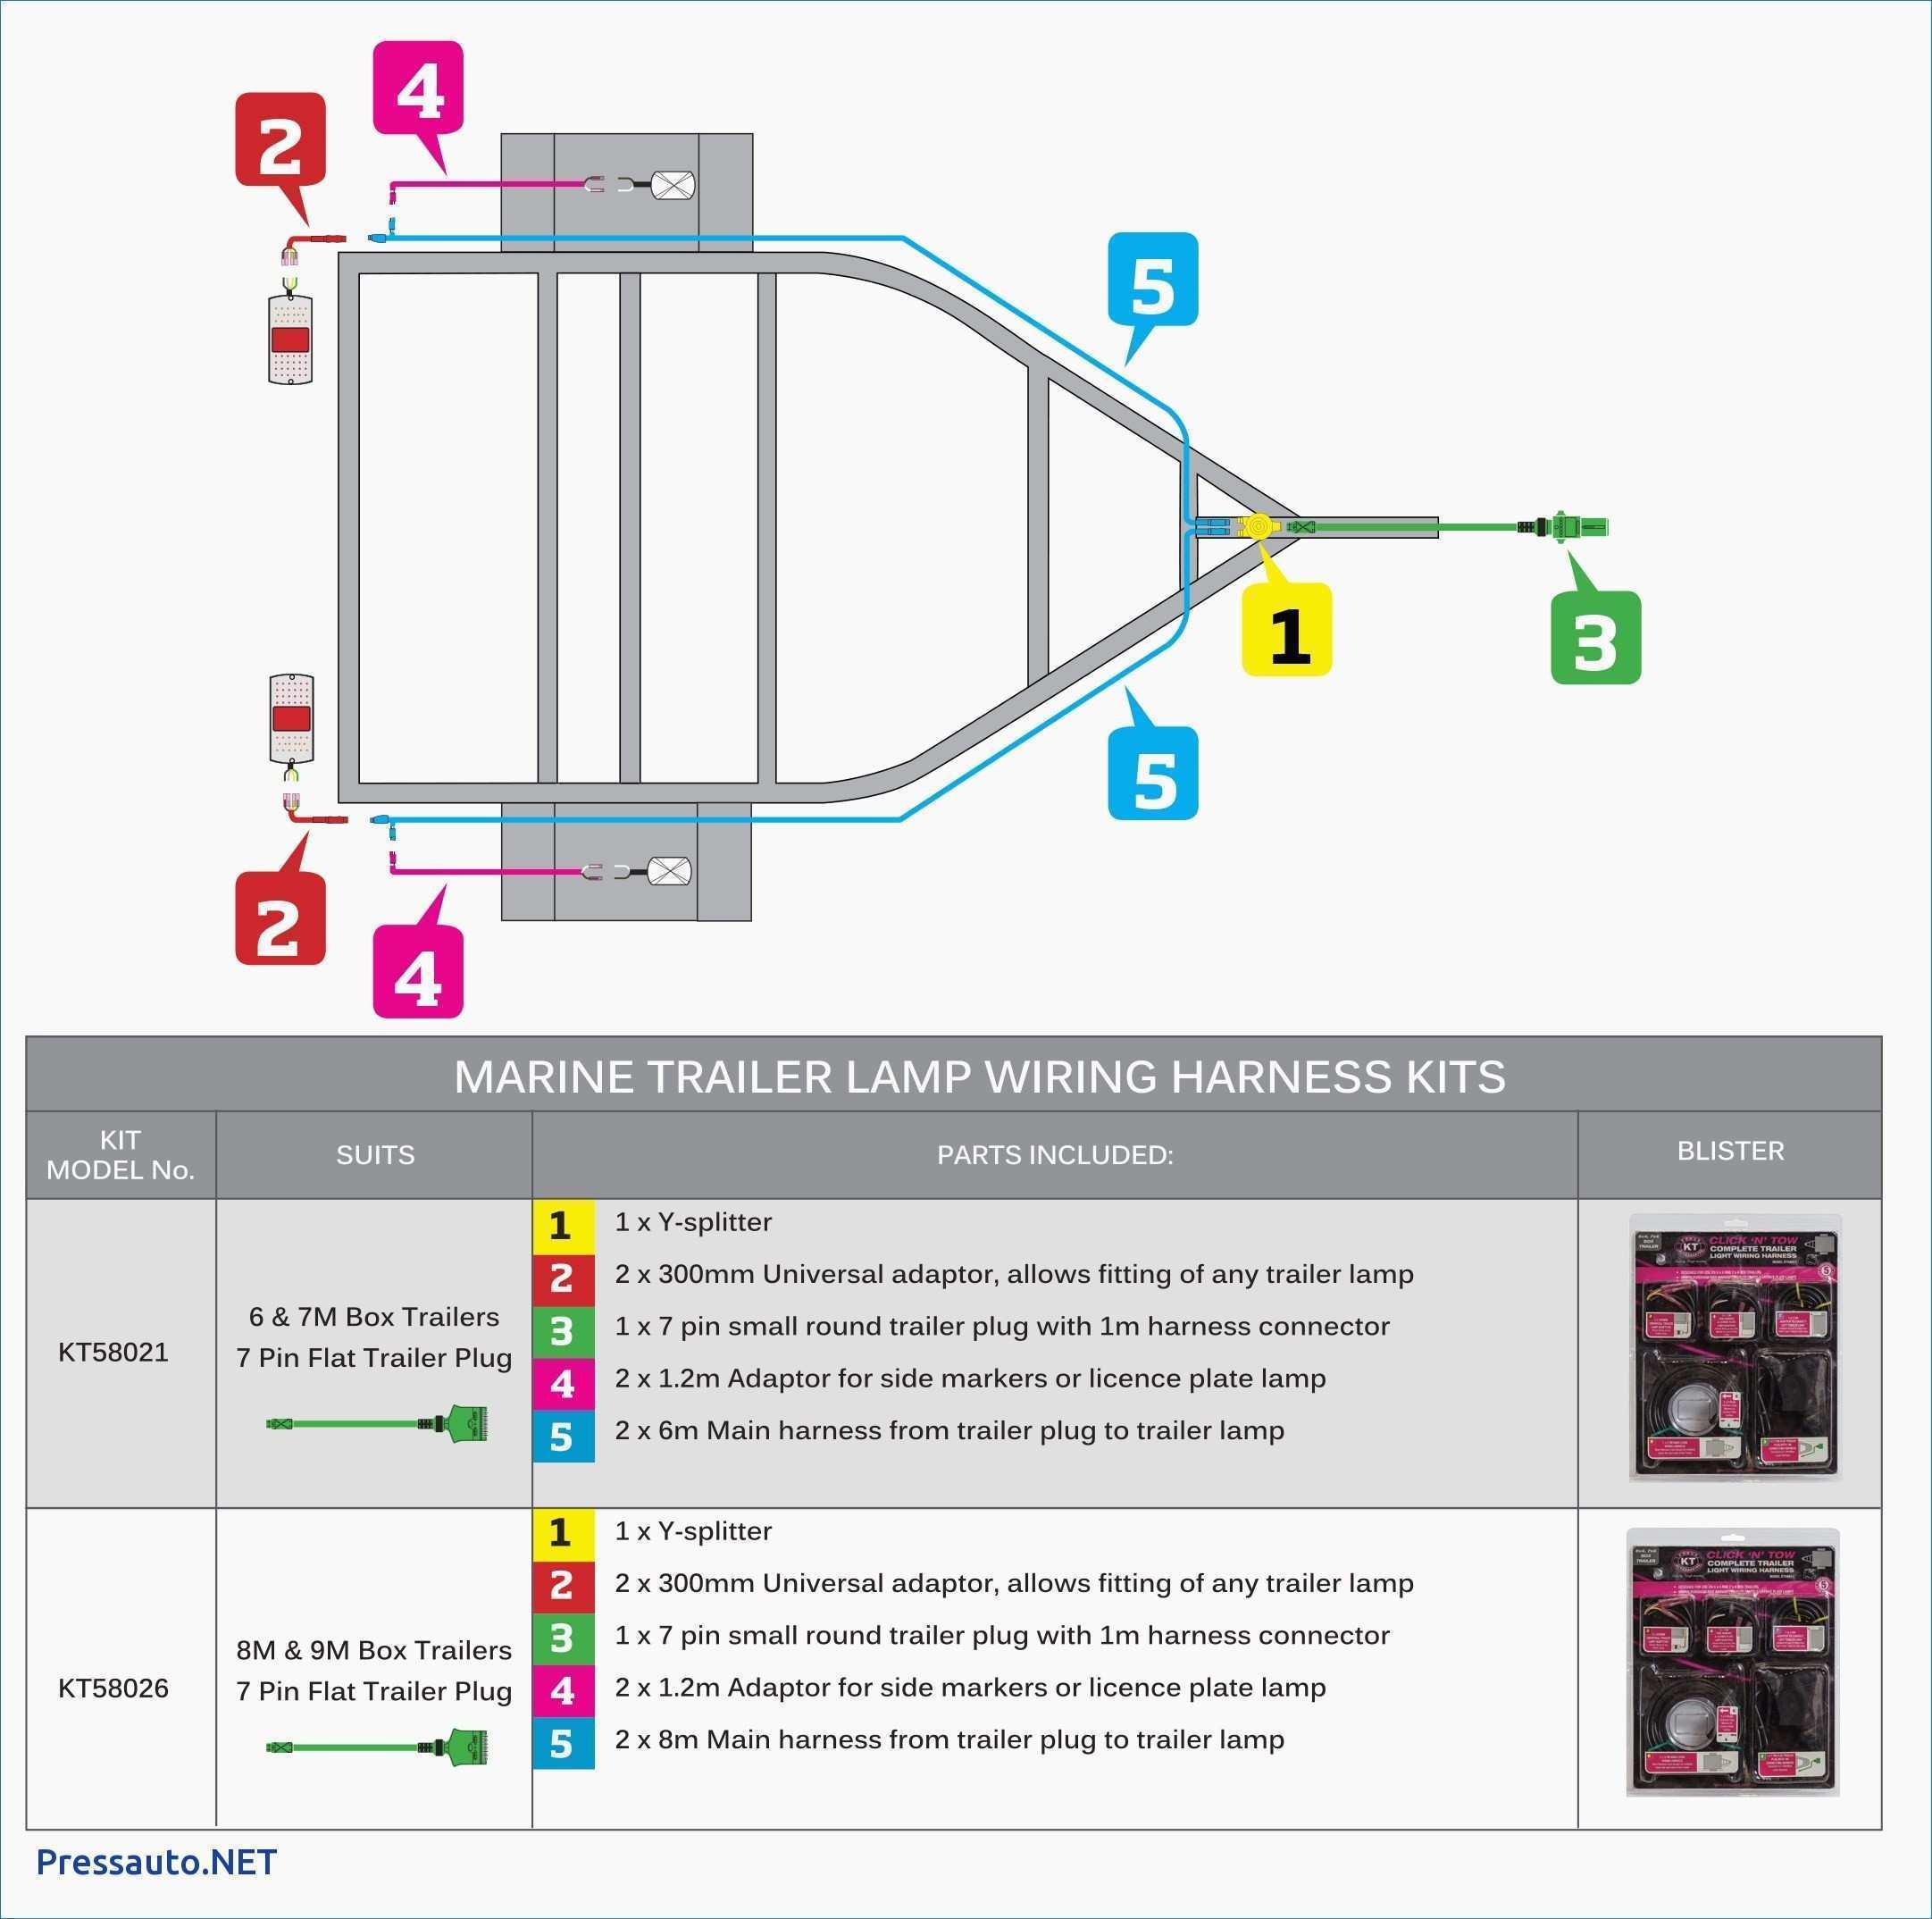 [SCHEMATICS_48EU]  OL_6653] Way Trailer Plug Wiring Diagram On Bargman Trailer Lights Wiring  Download Diagram | 7 Prong Wiring Harness |  | Kumb Oper Sple None Salv Nful Rect Mohammedshrine Librar Wiring 101